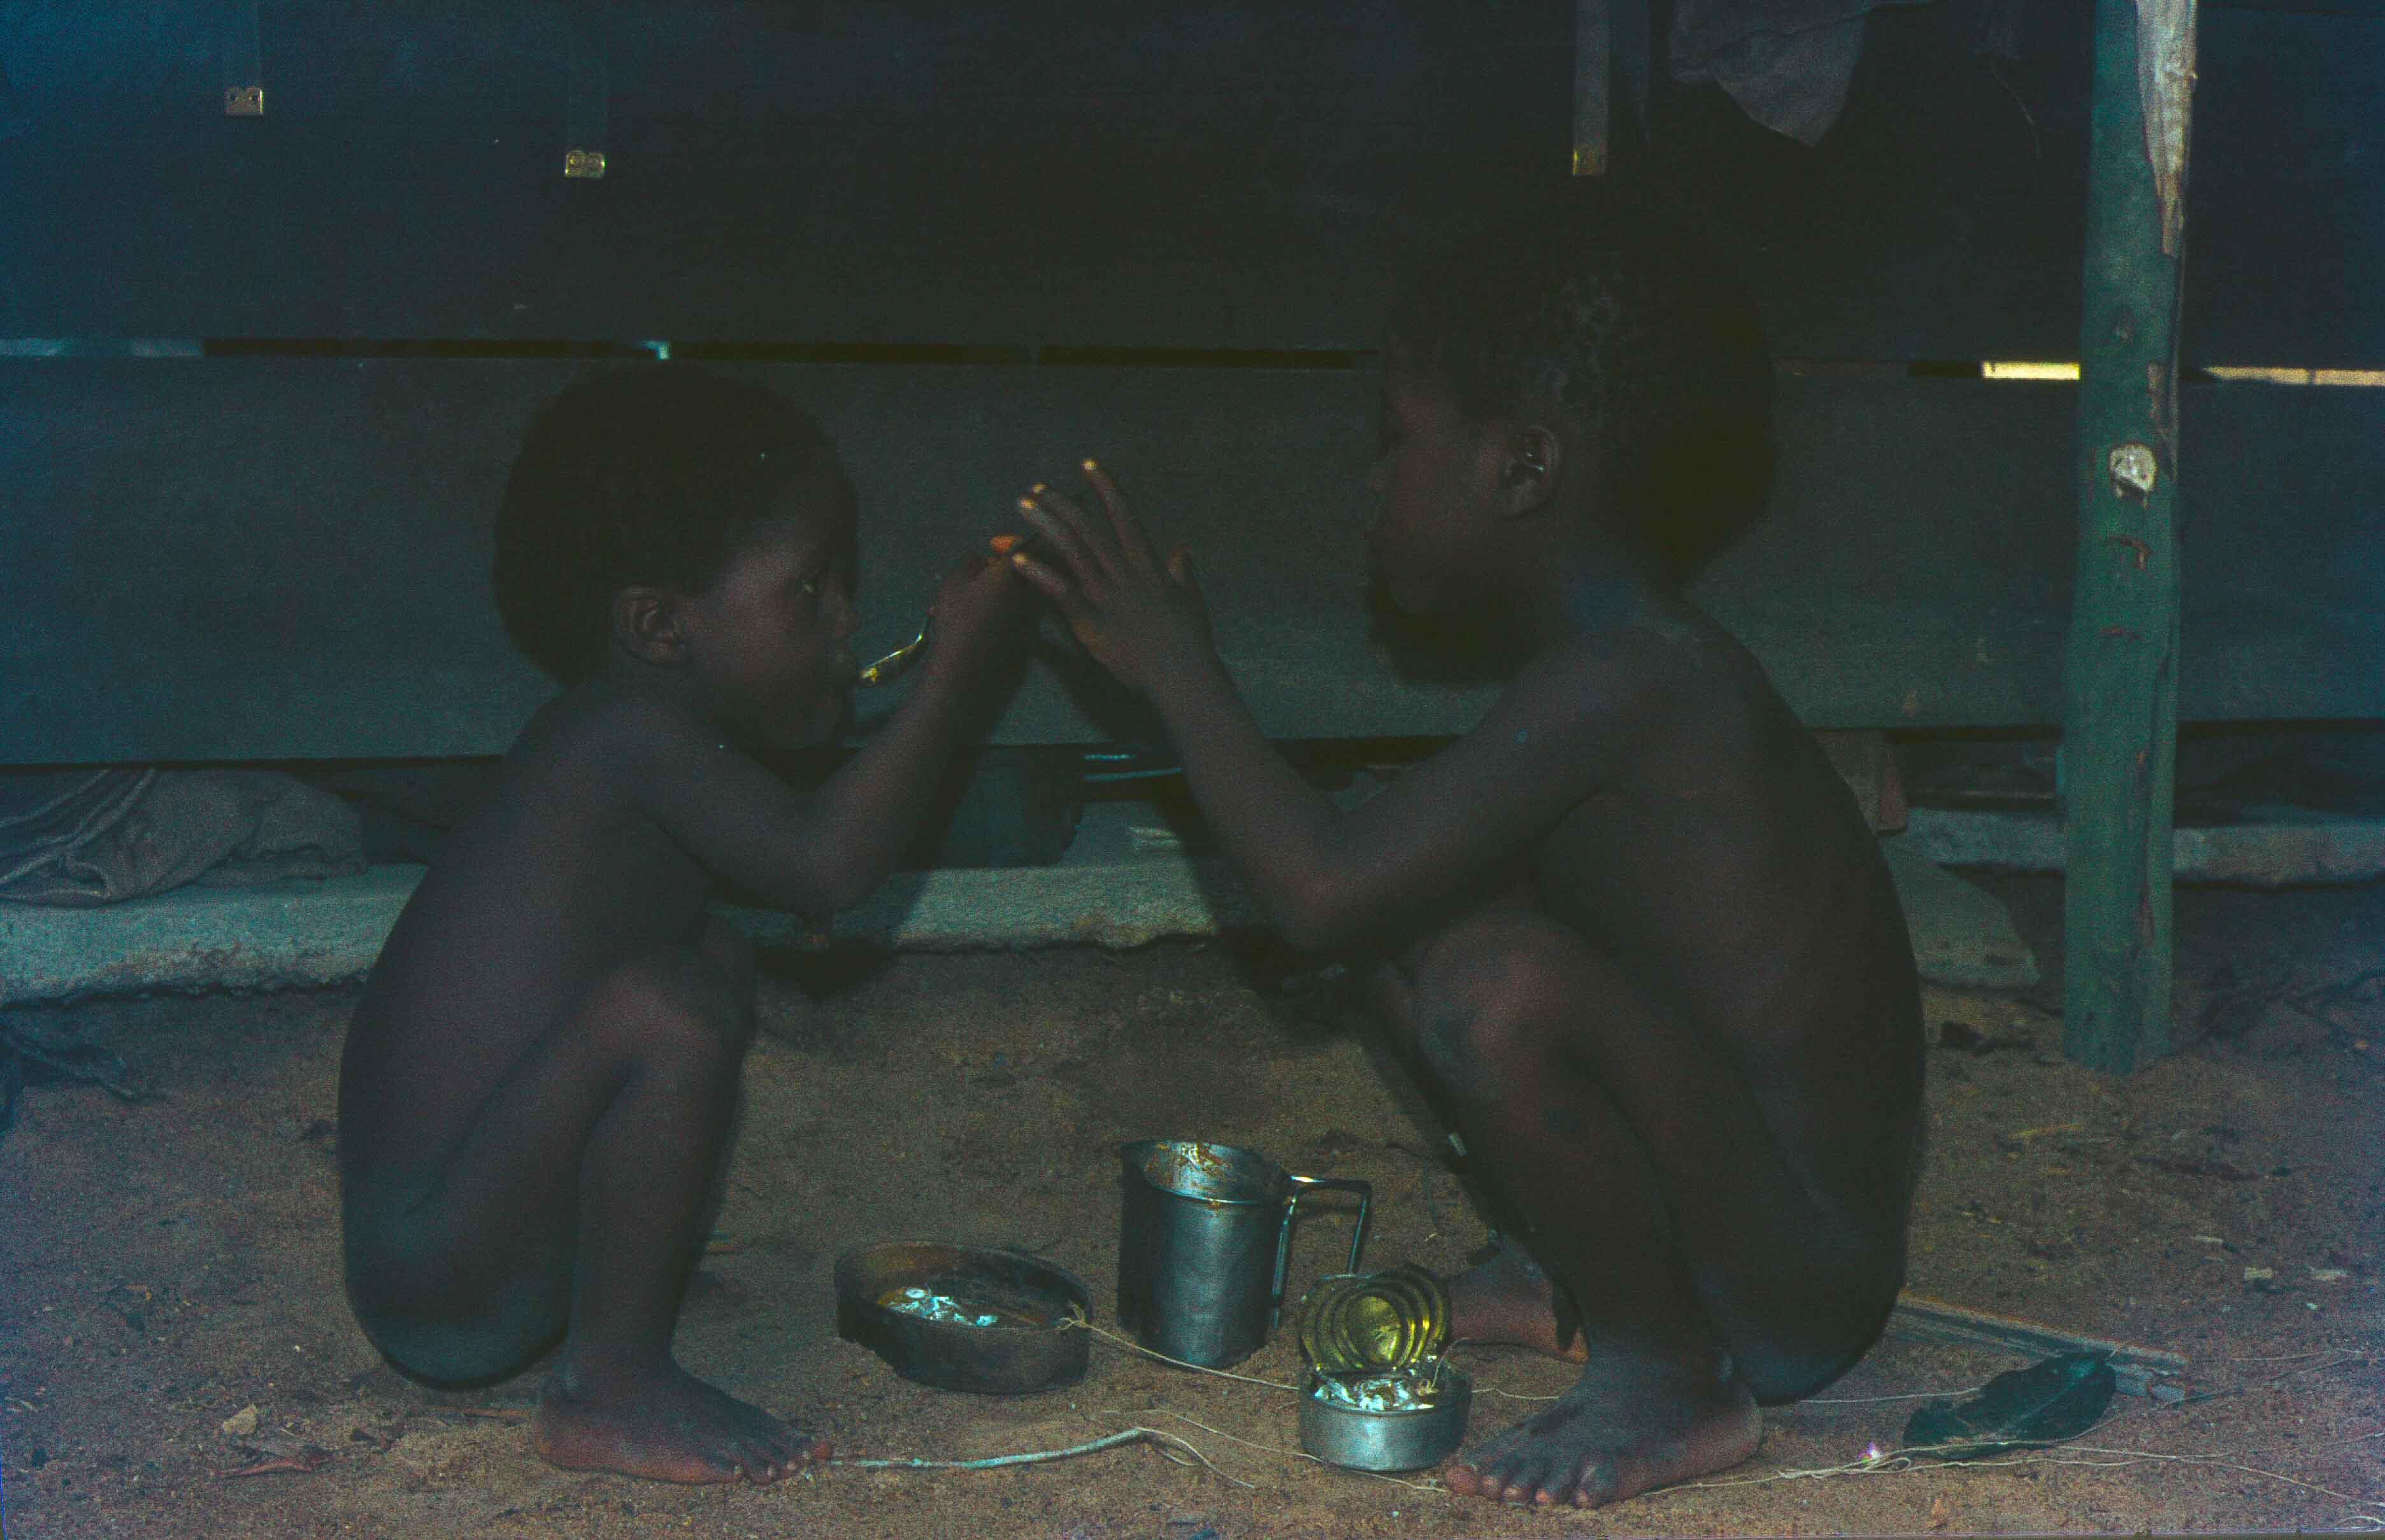 479. Suriname